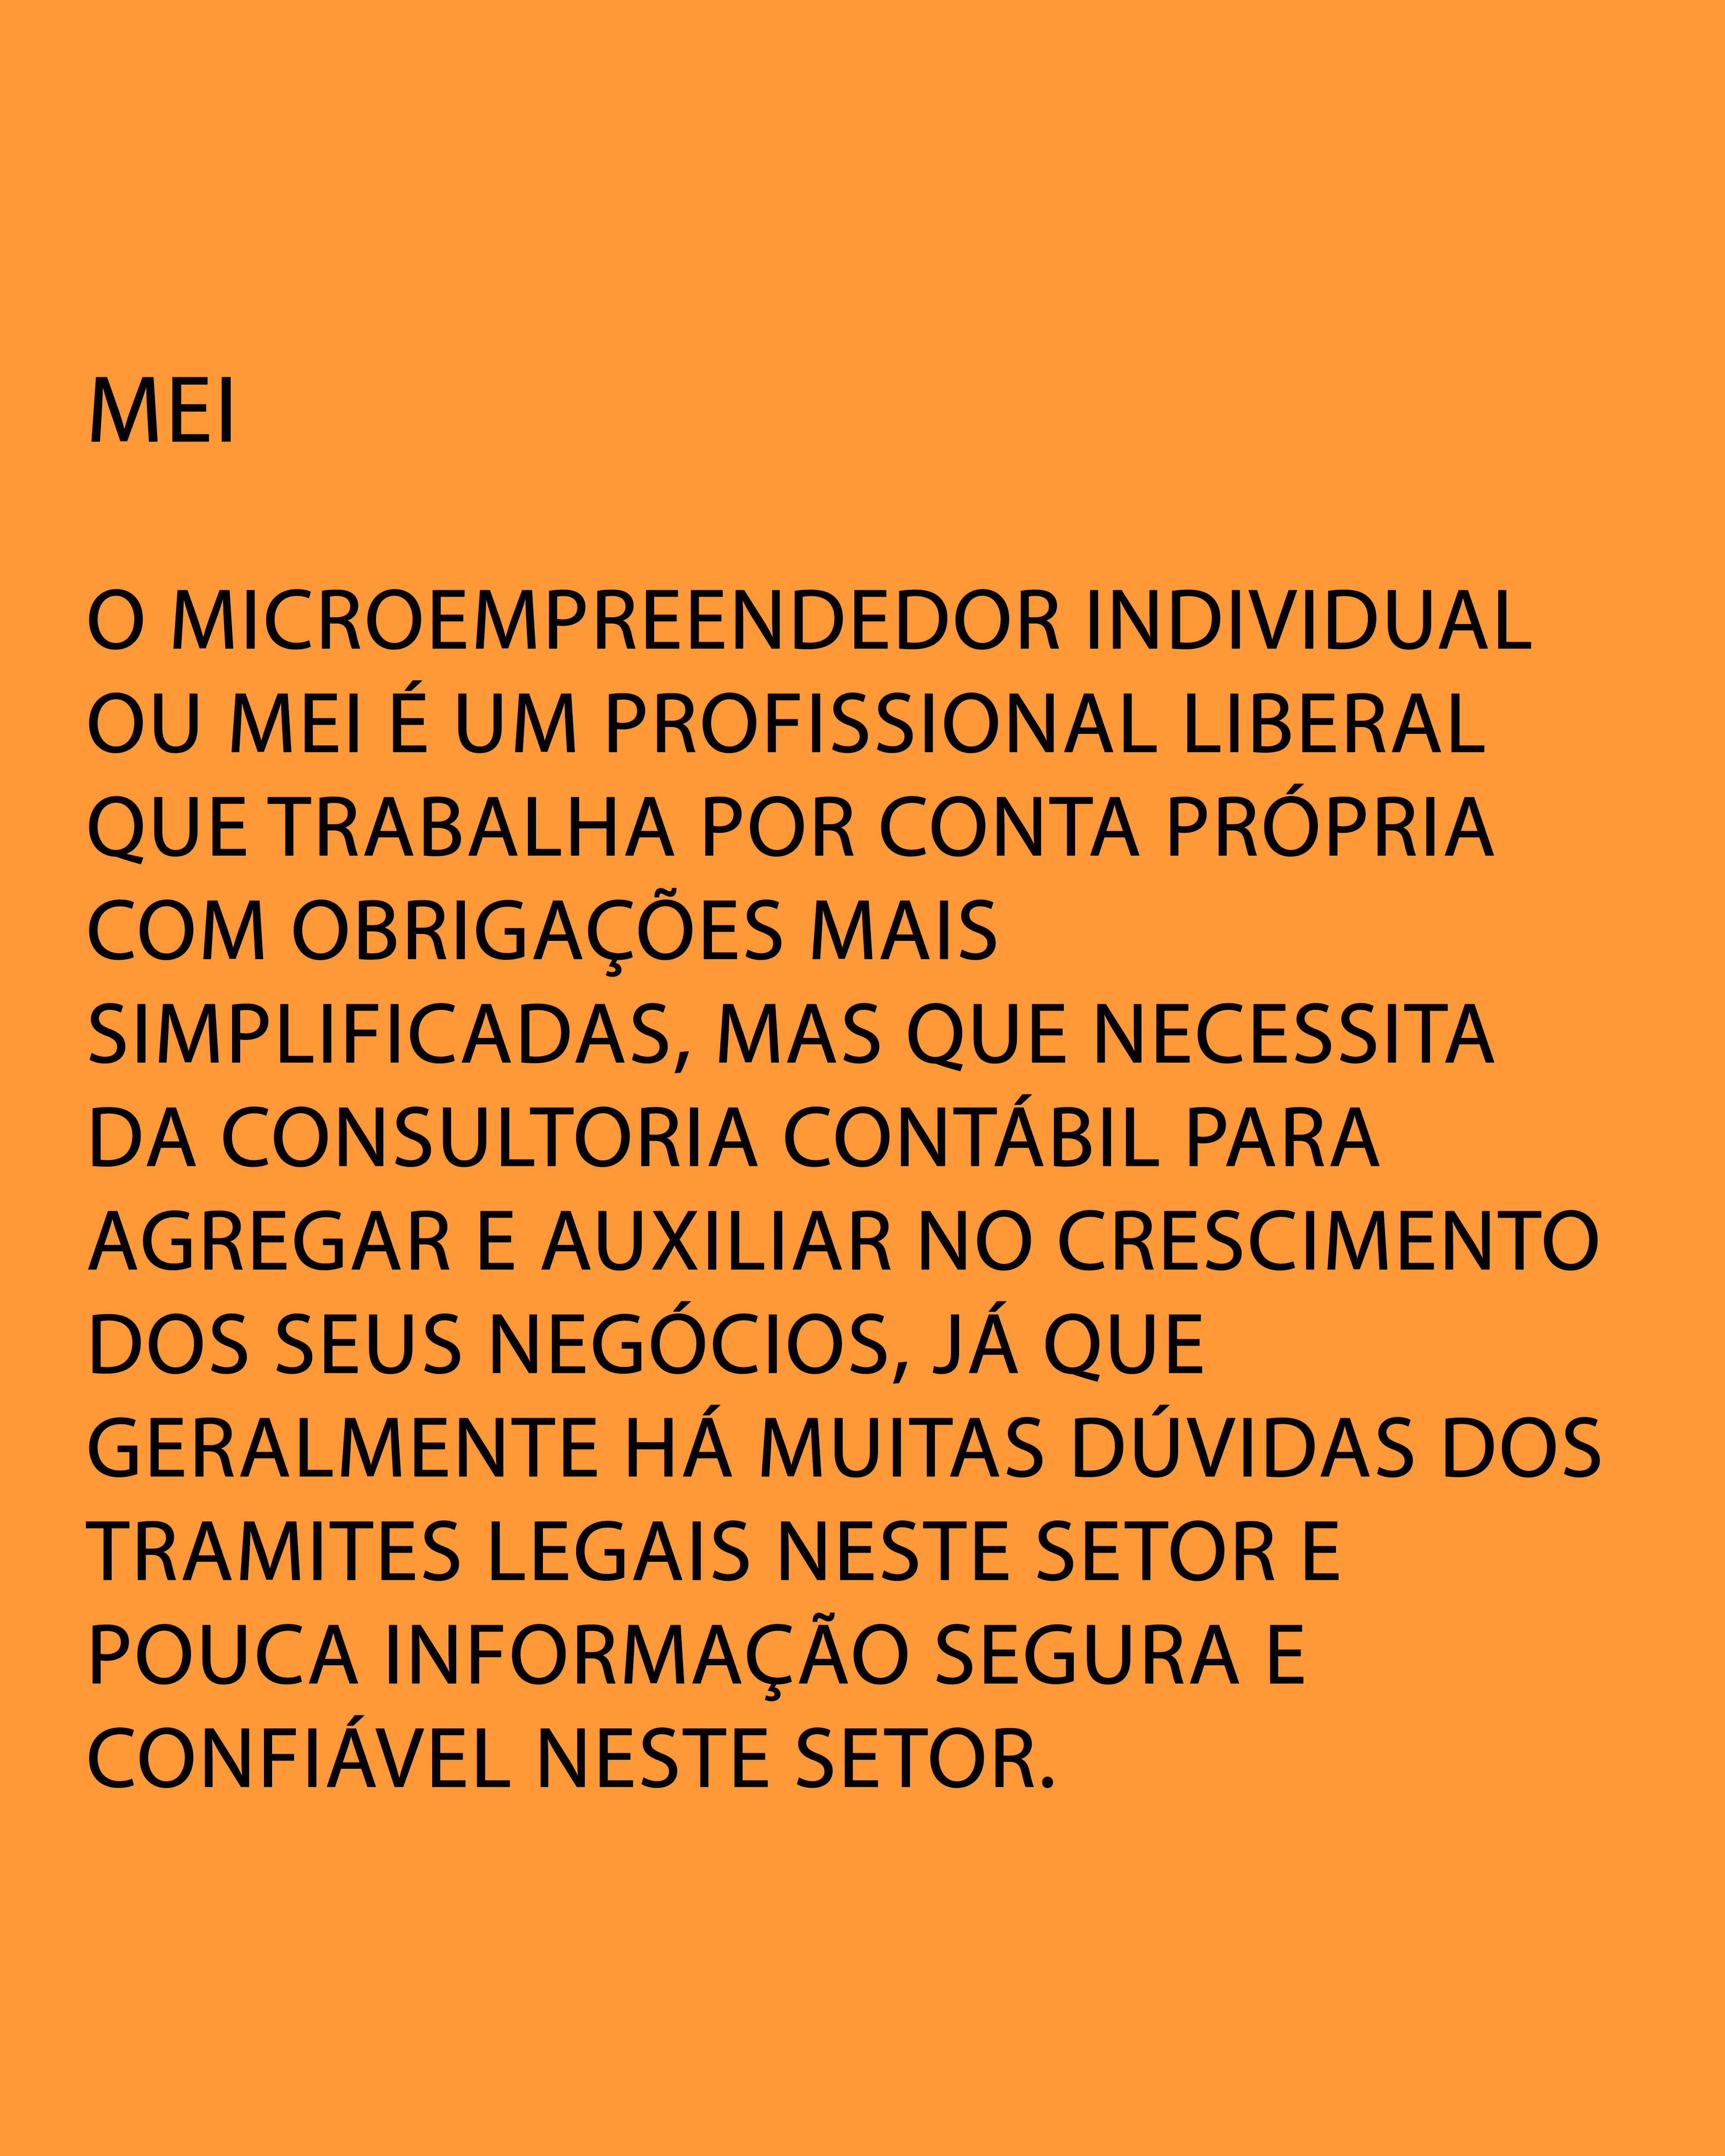 texto_mei